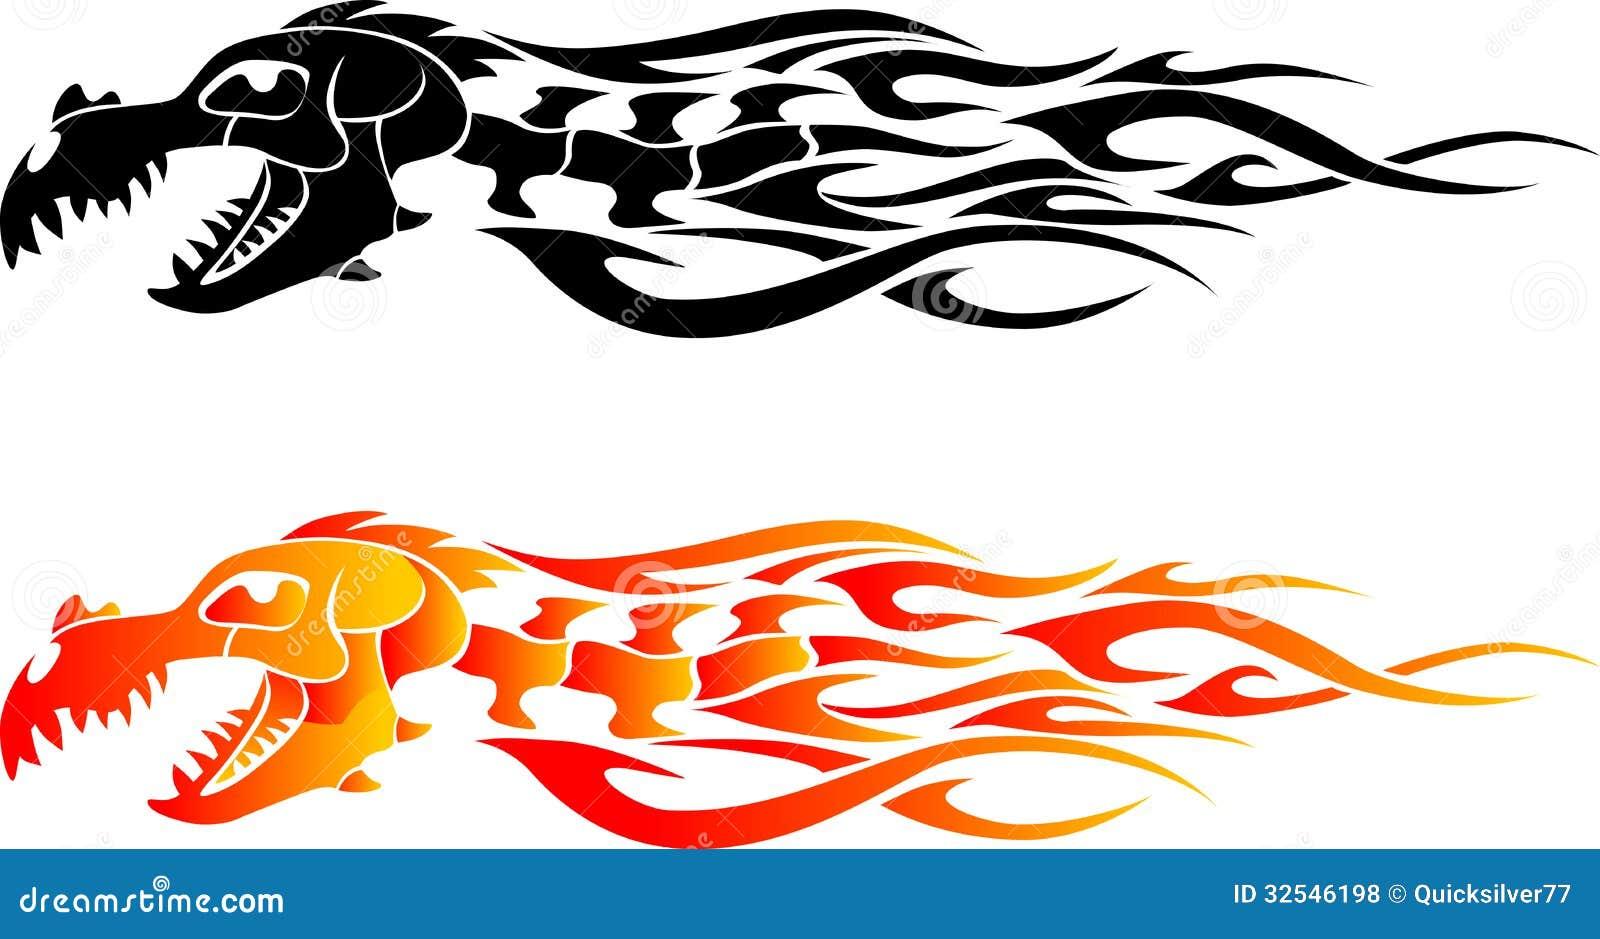 Dragon Bone Flame Tattoo Stock Illustration. Image Of